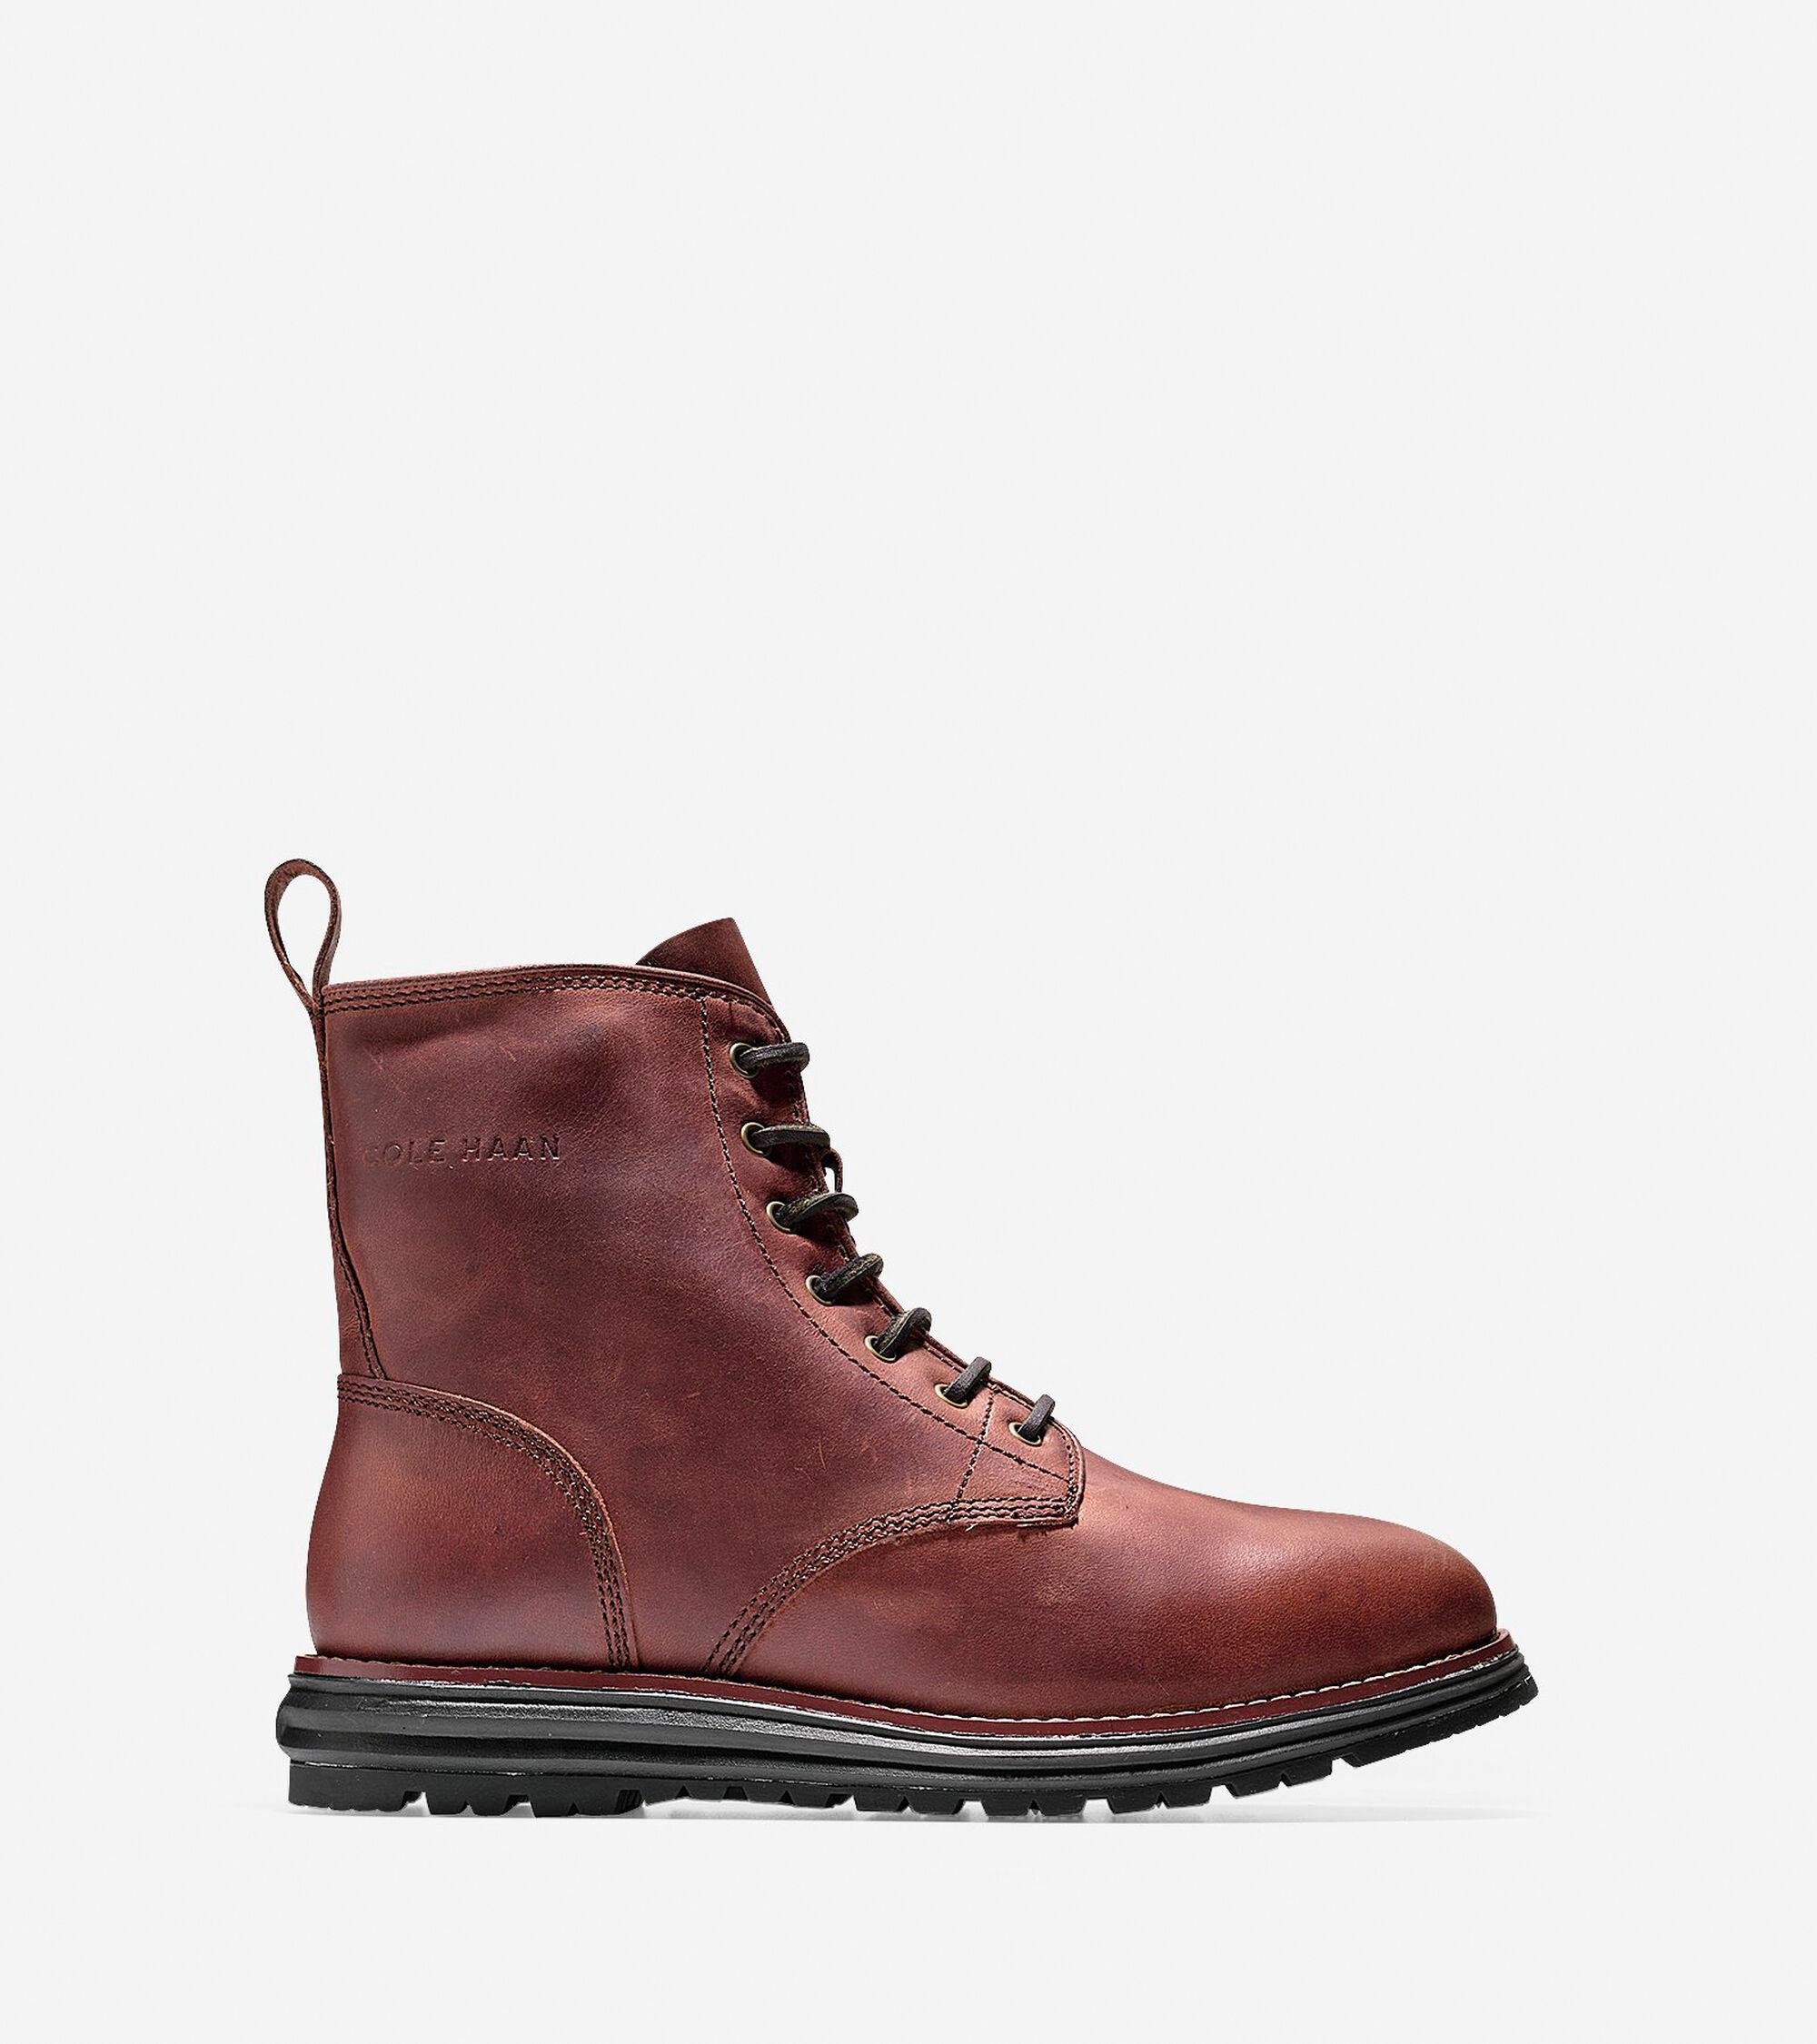 73ed6e01472 Lockridge Waterproof Lace Boots in Burnt Chili